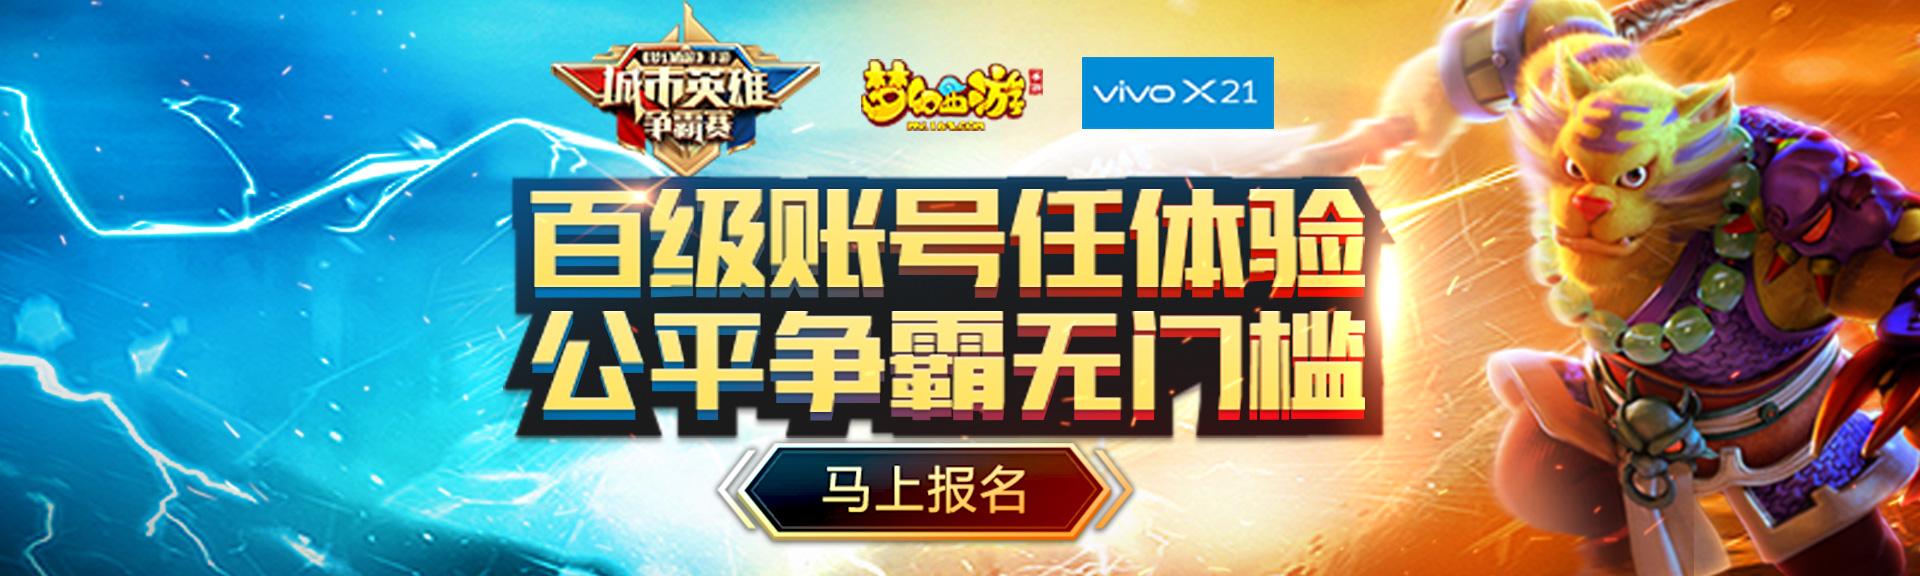 vivo X21《梦幻西游》手游2018城市英雄争霸赛春季赛第二轮周赛战果决出